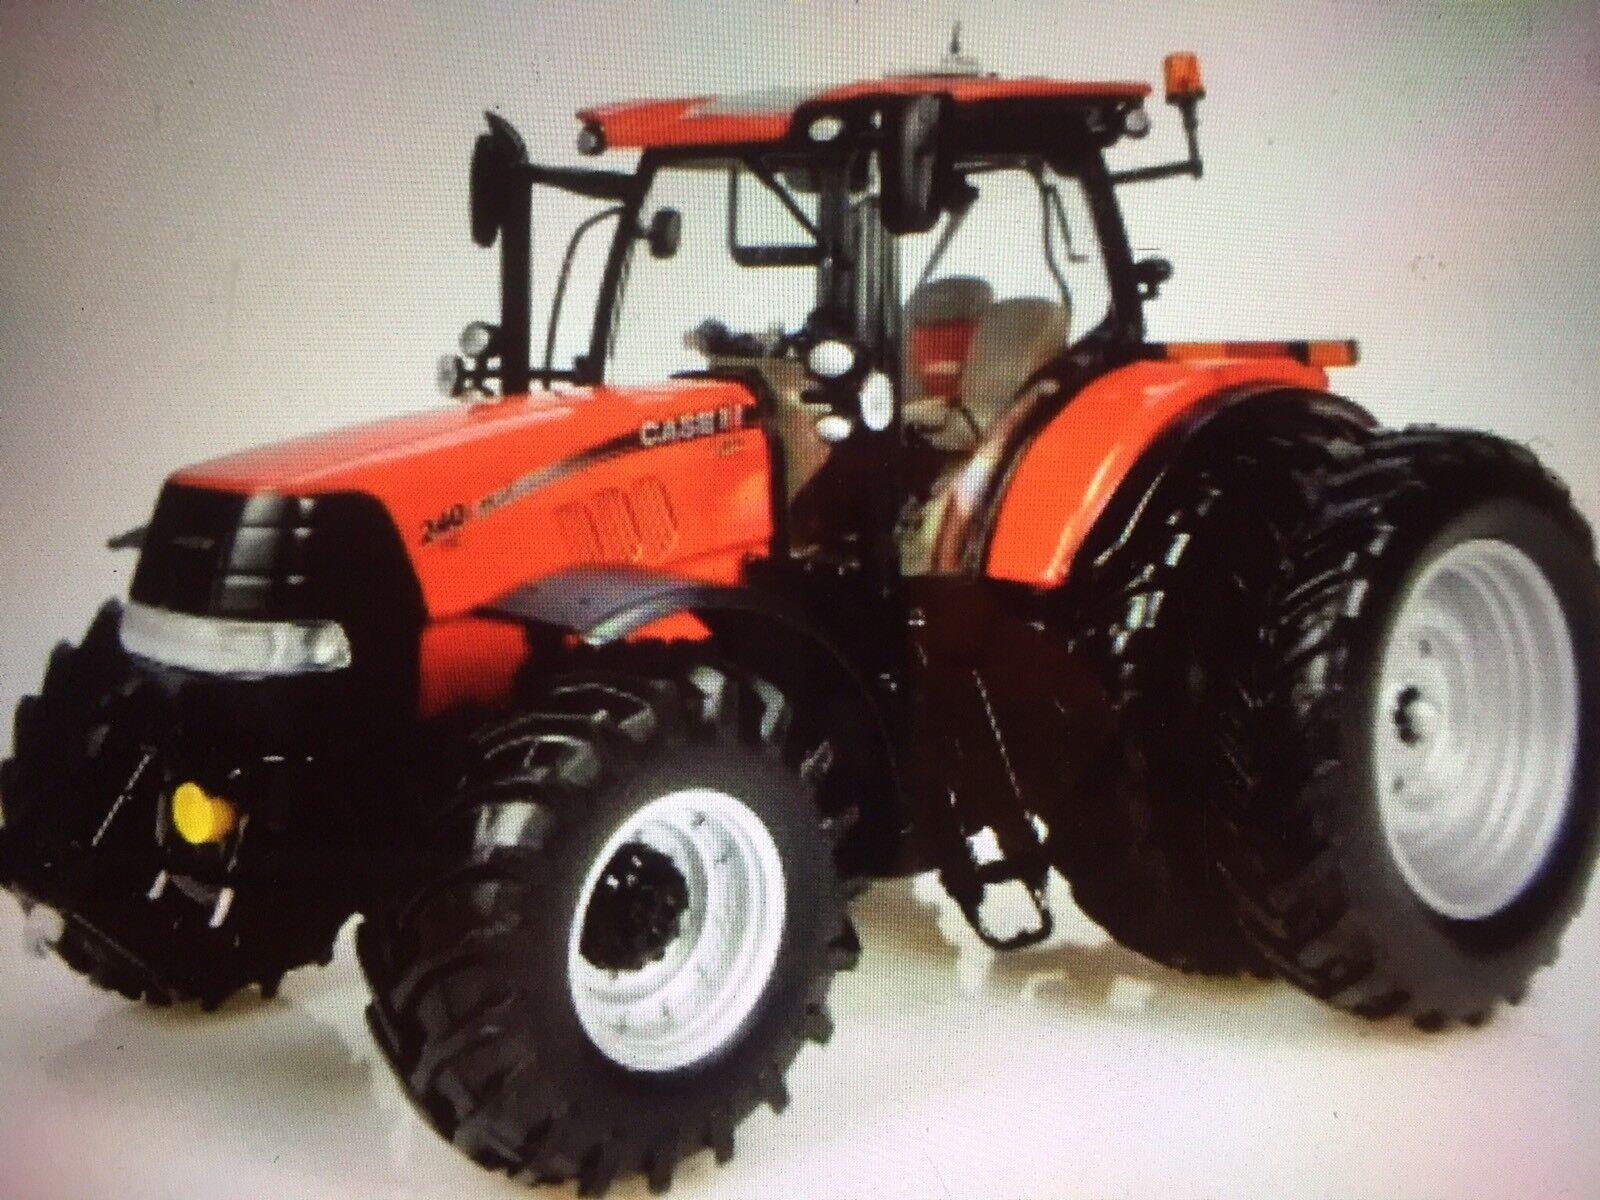 Universal Hobbies  Case IH Puma CVX240 Dual Wheels US Version  Uh4961 1.32 Scale